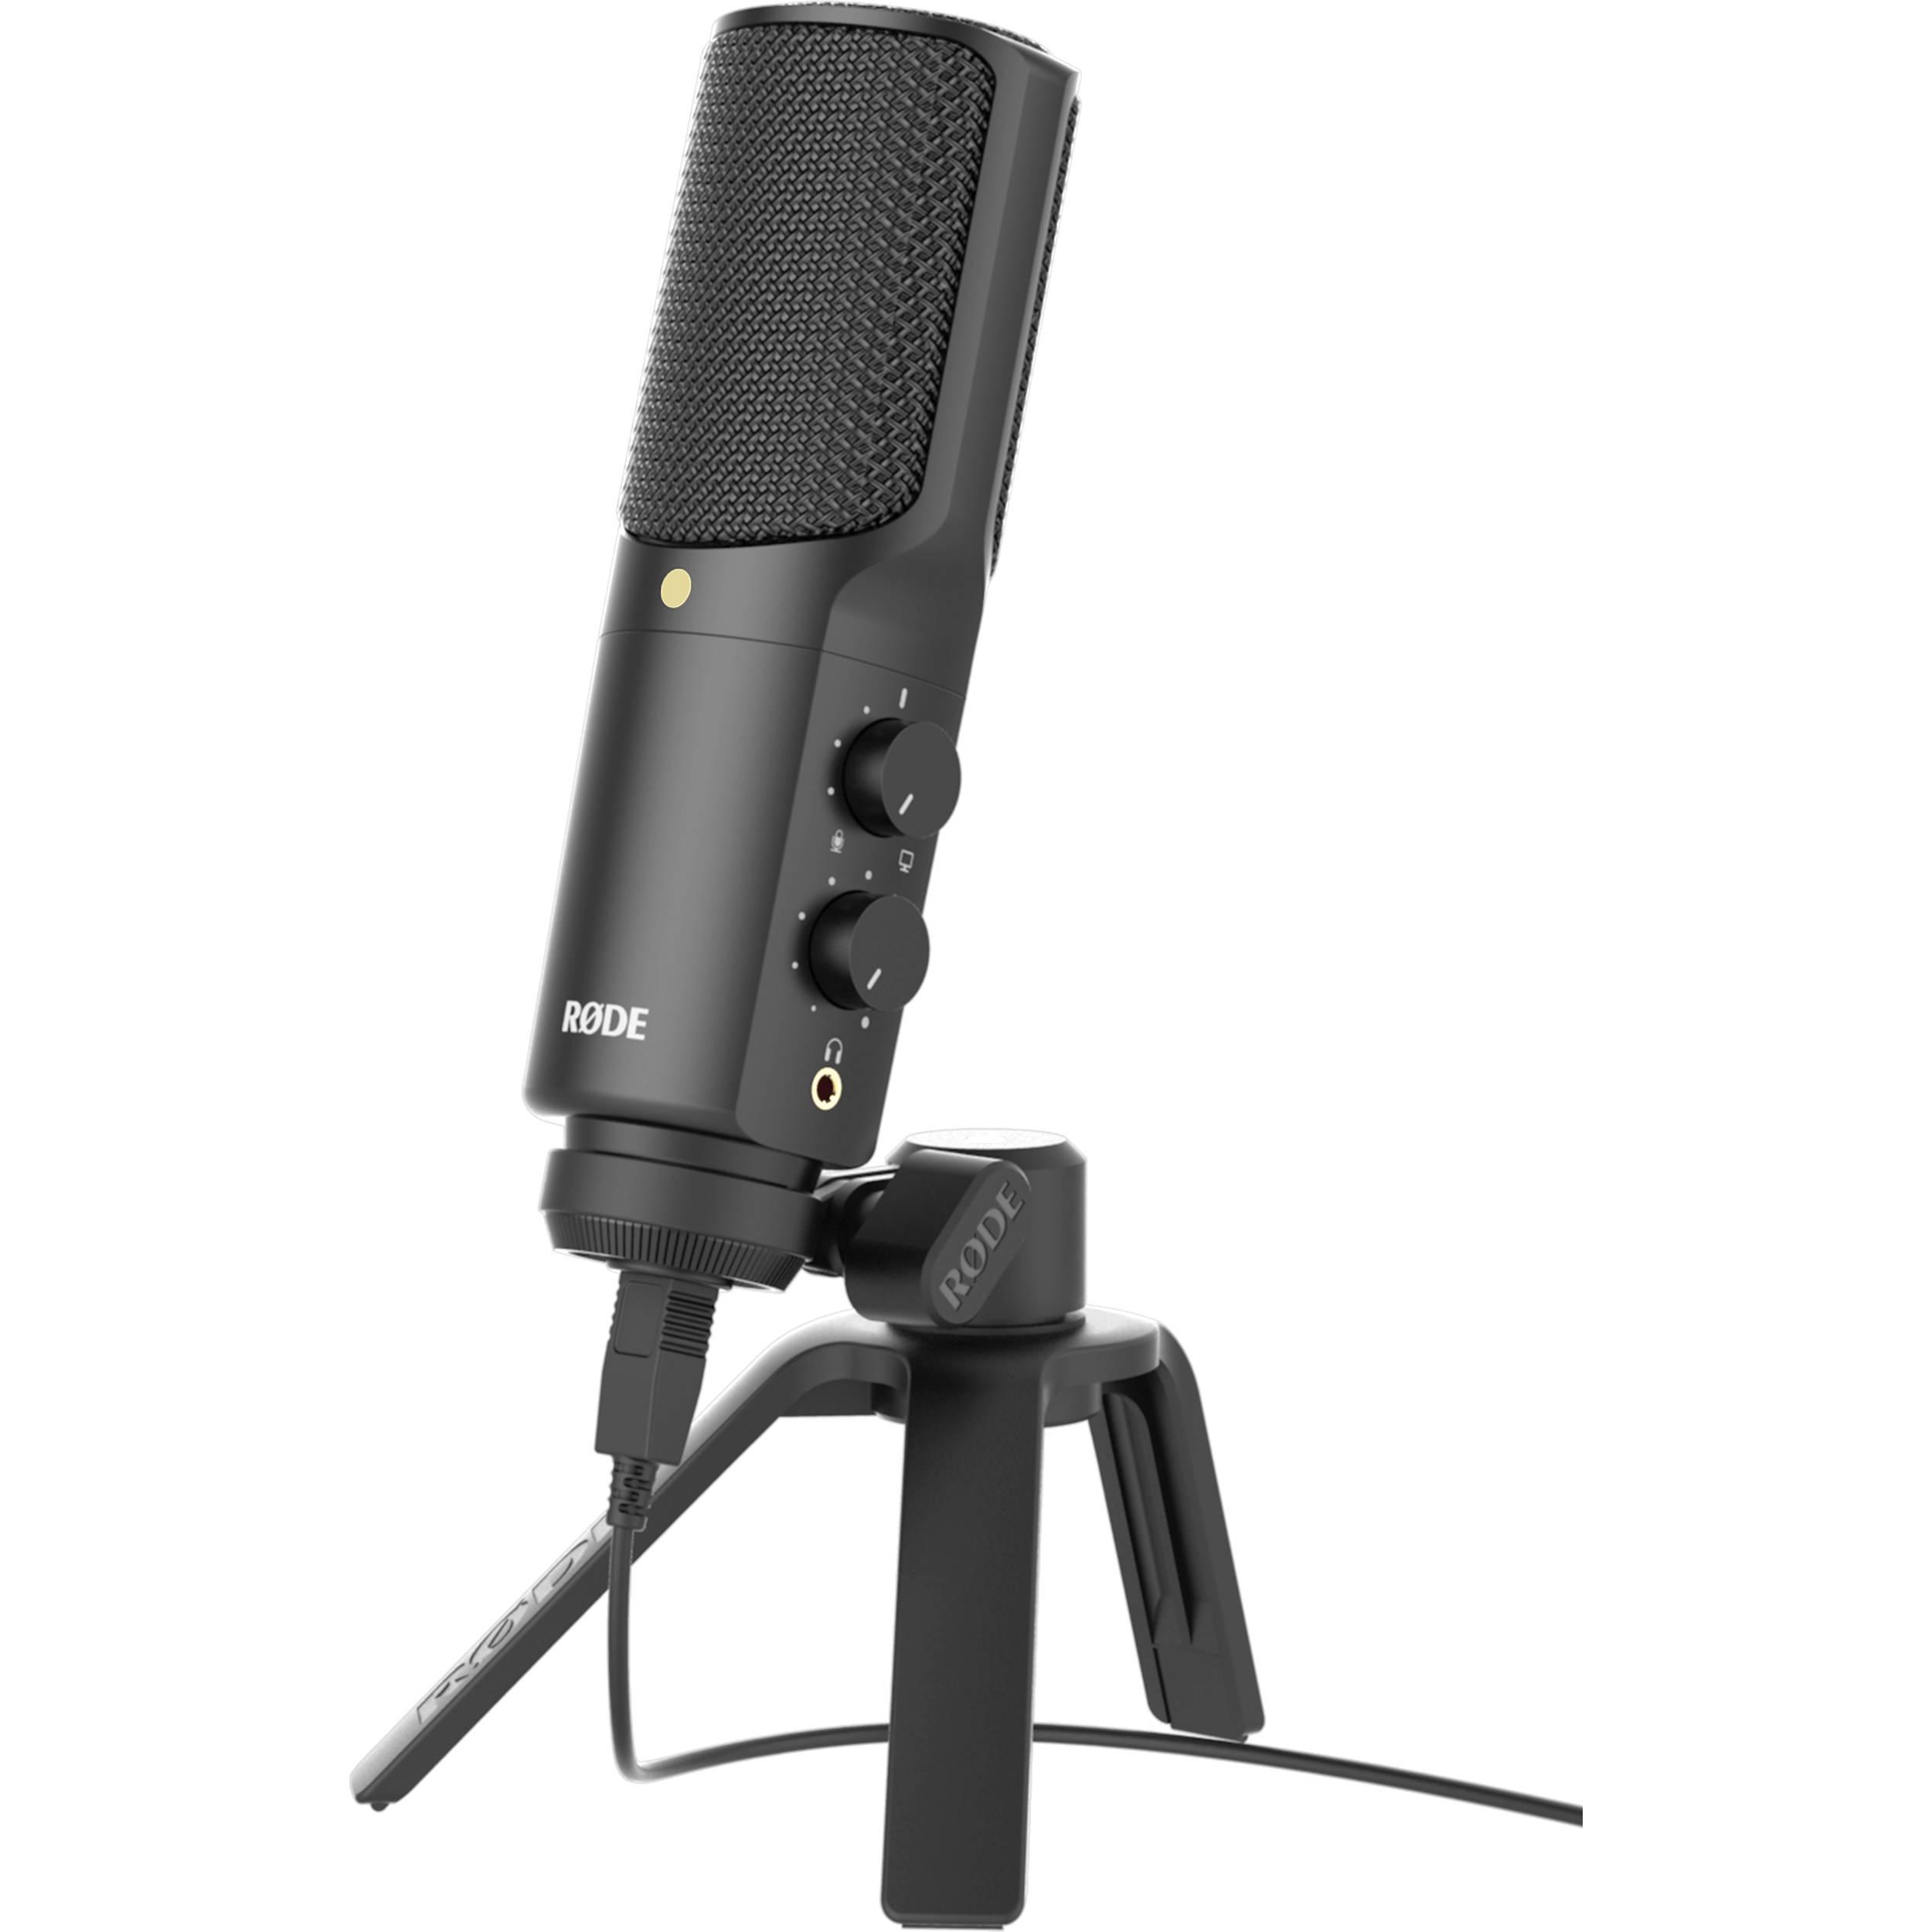 Rode NT-USB Versatile Studio-Quality USB Microphone NTUSB MIC  IN BOX